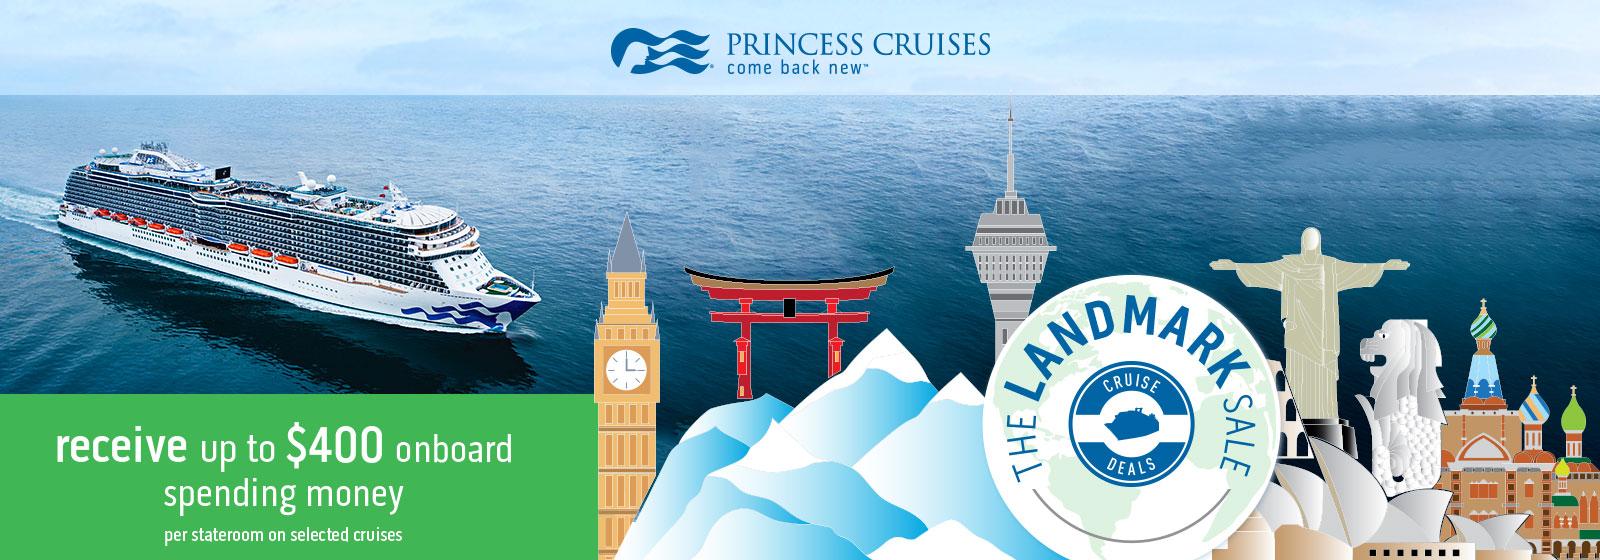 Princess Cruises Landmark Sale-new3